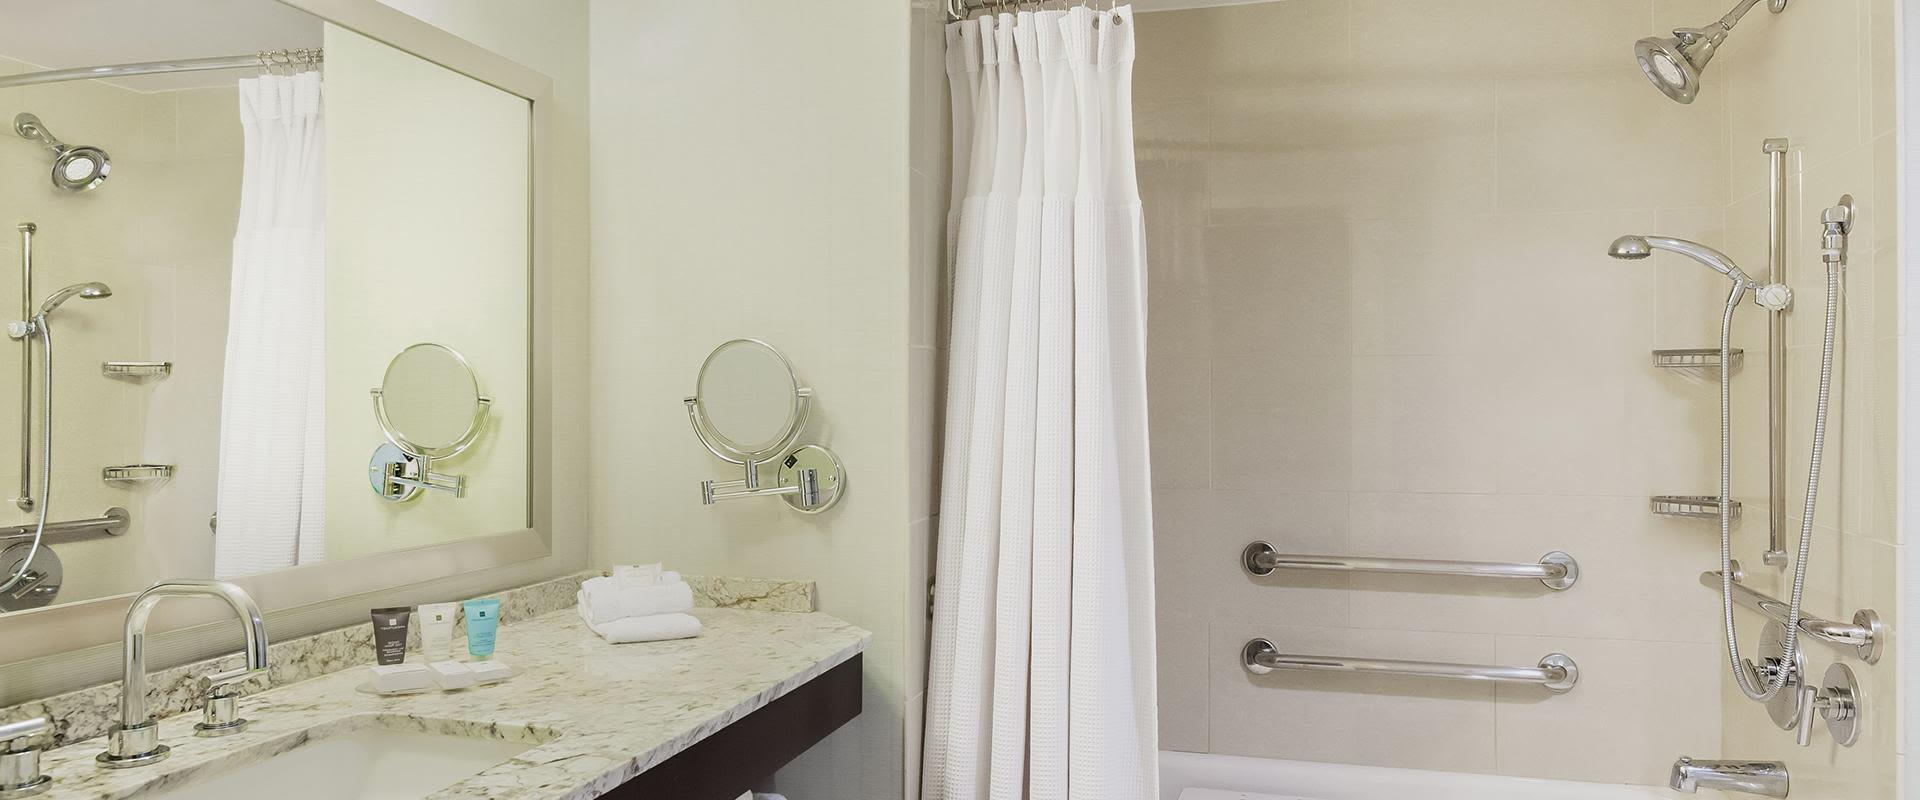 Redondo Beach ADA Bathroom Interior